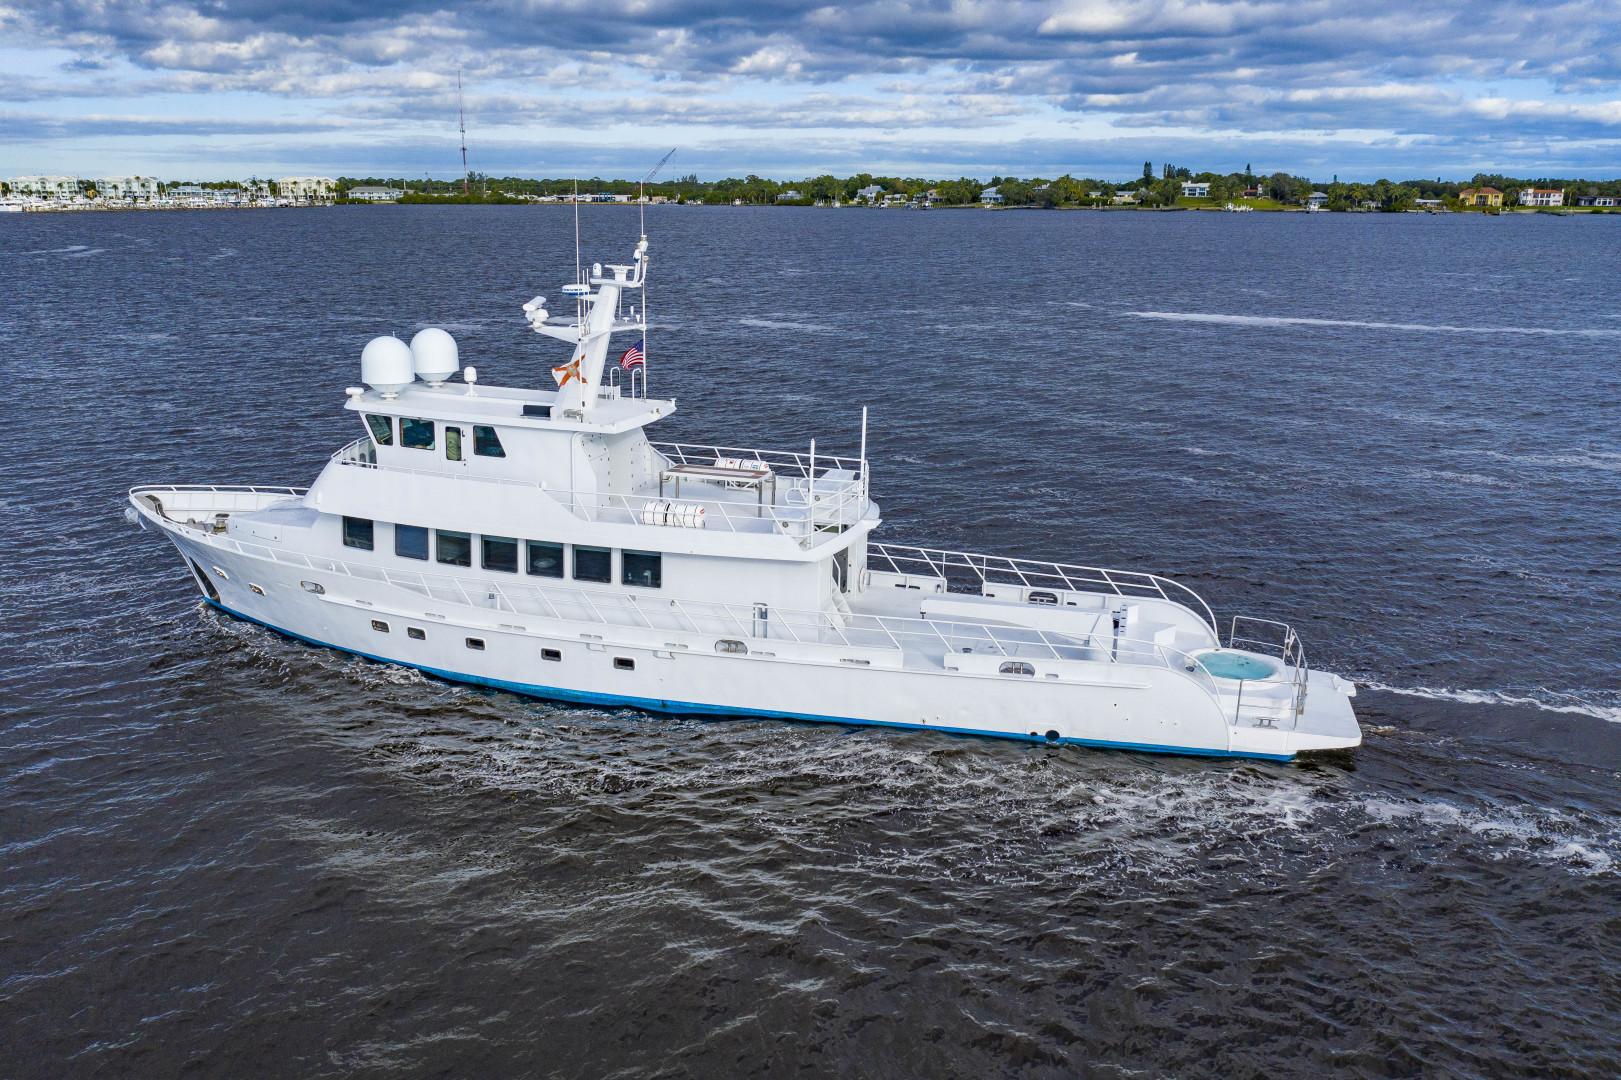 GlassTech-Expedition Yacht 2018-Reset Stuart-Florida-United States-Profile-1568522 | Thumbnail